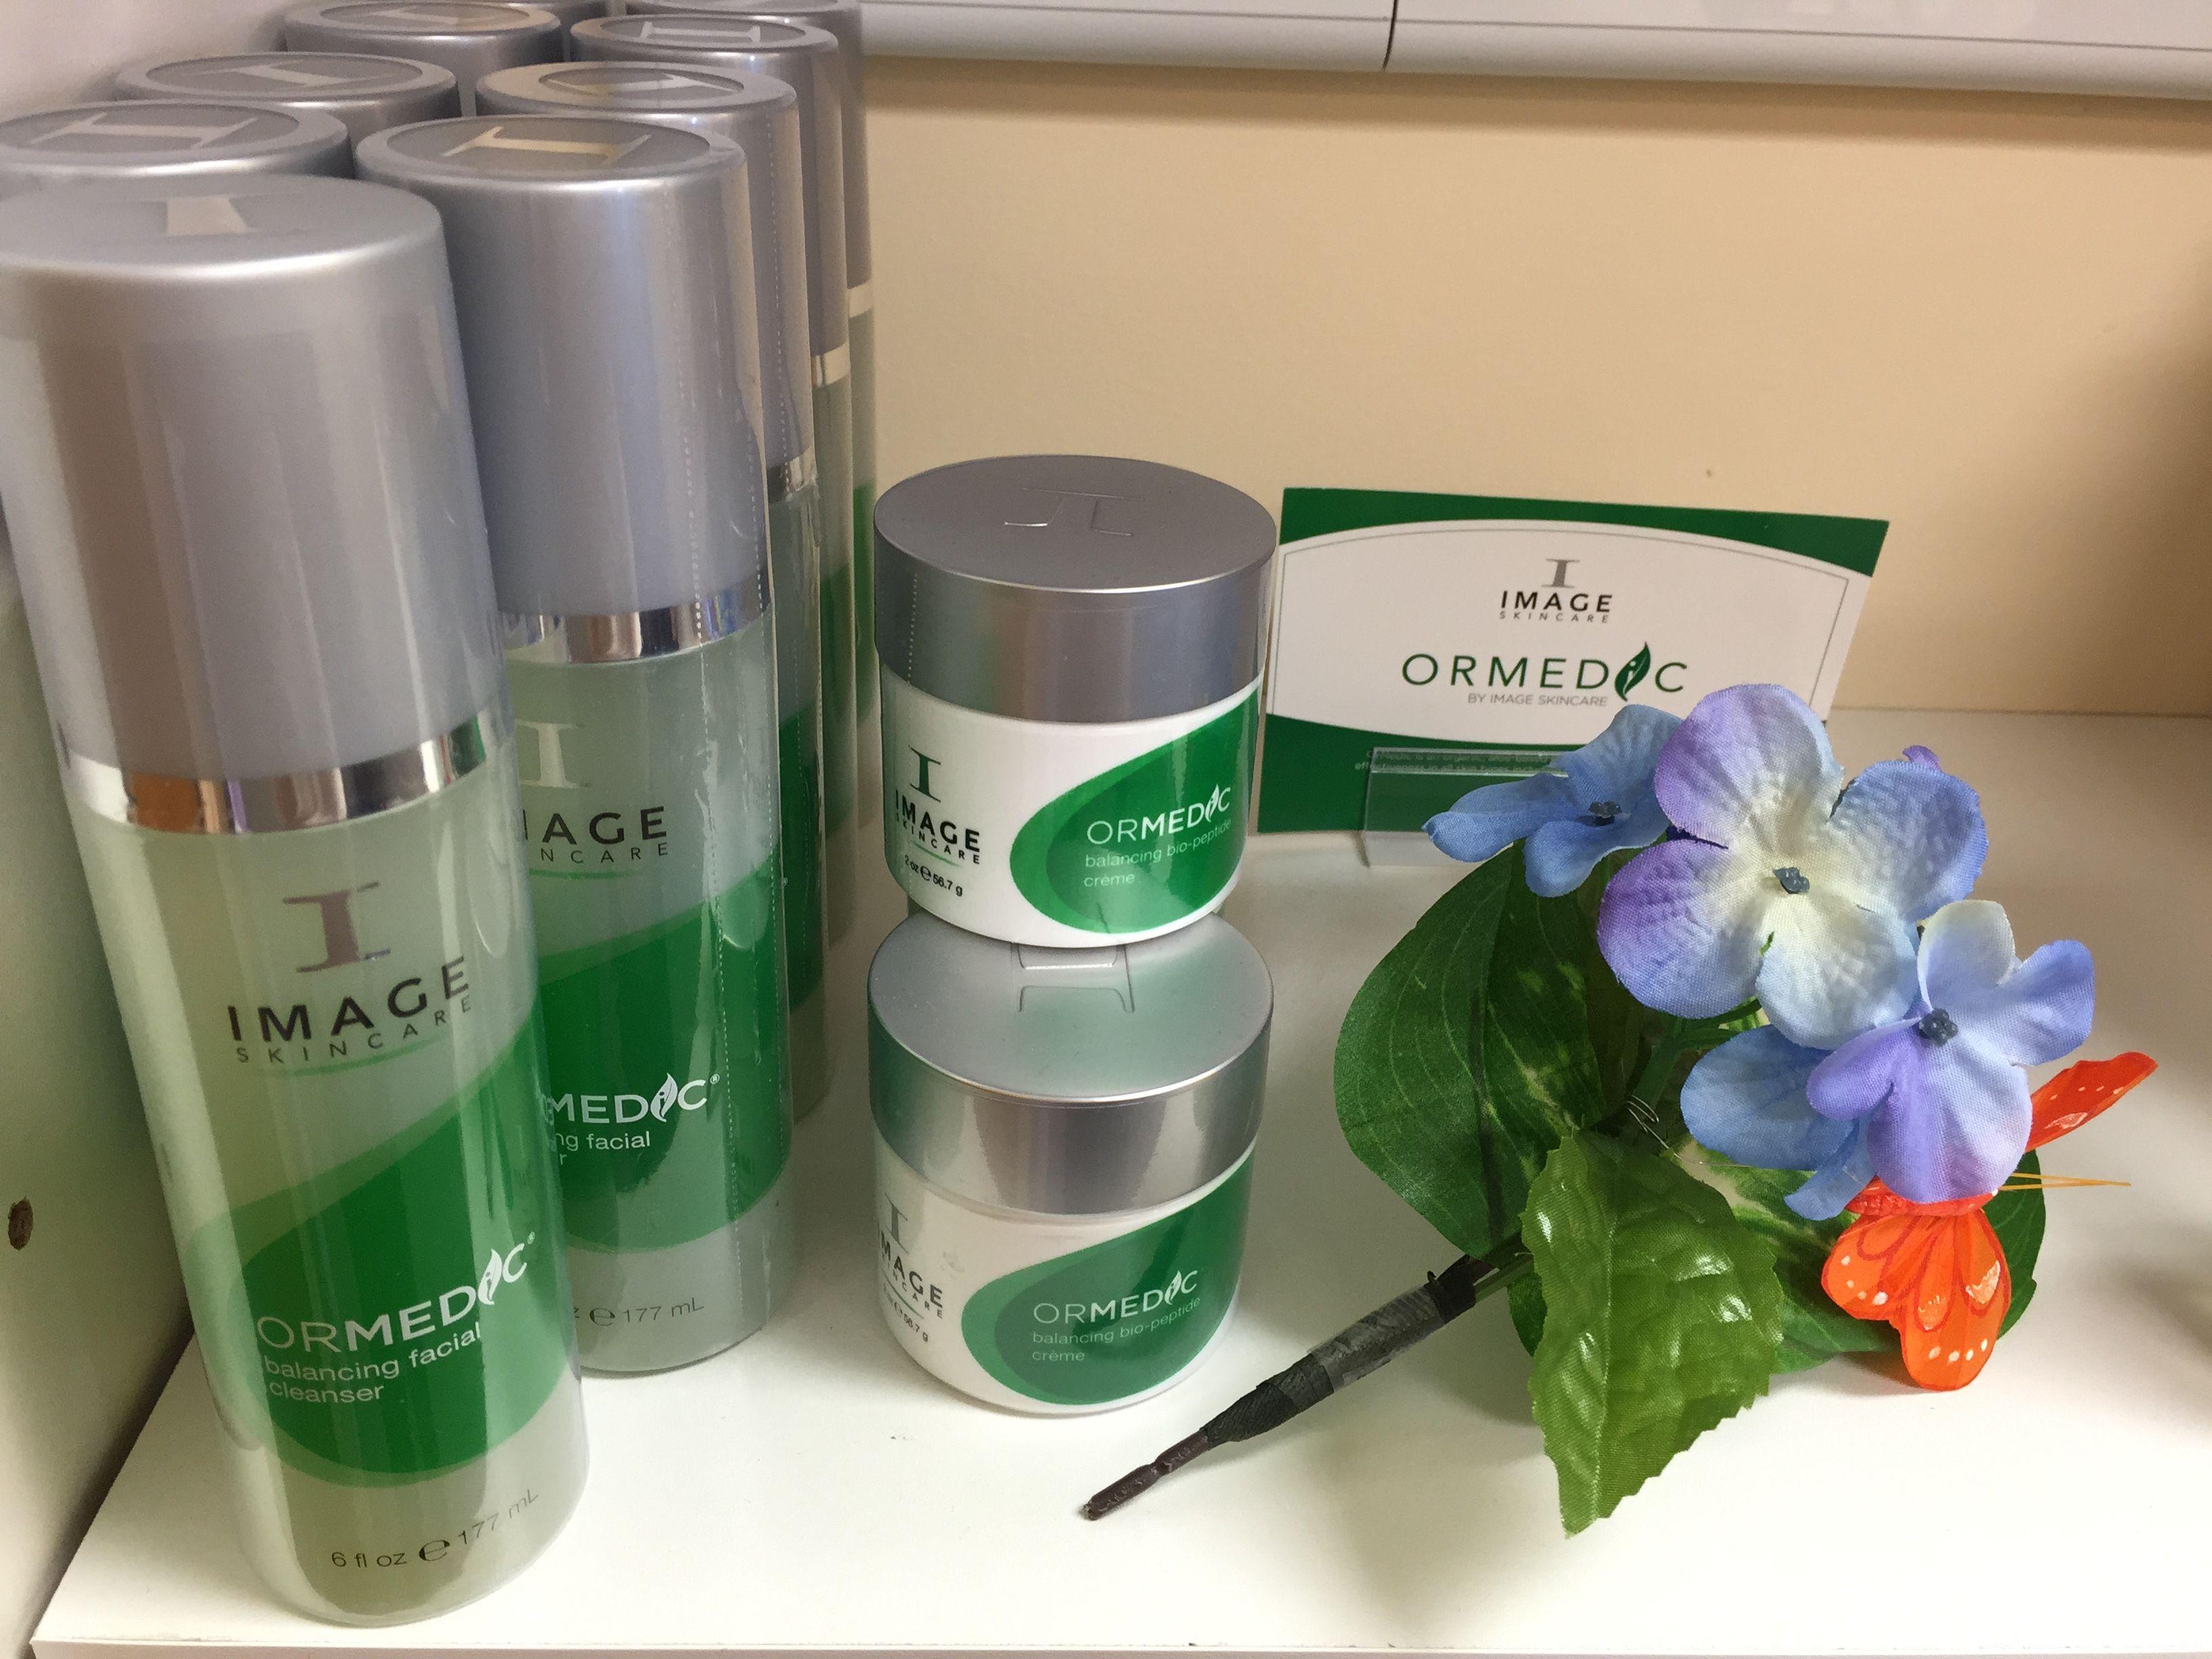 Image Ormedic Balancing Facial Cleanser 6 Oz 2800 Ormedic